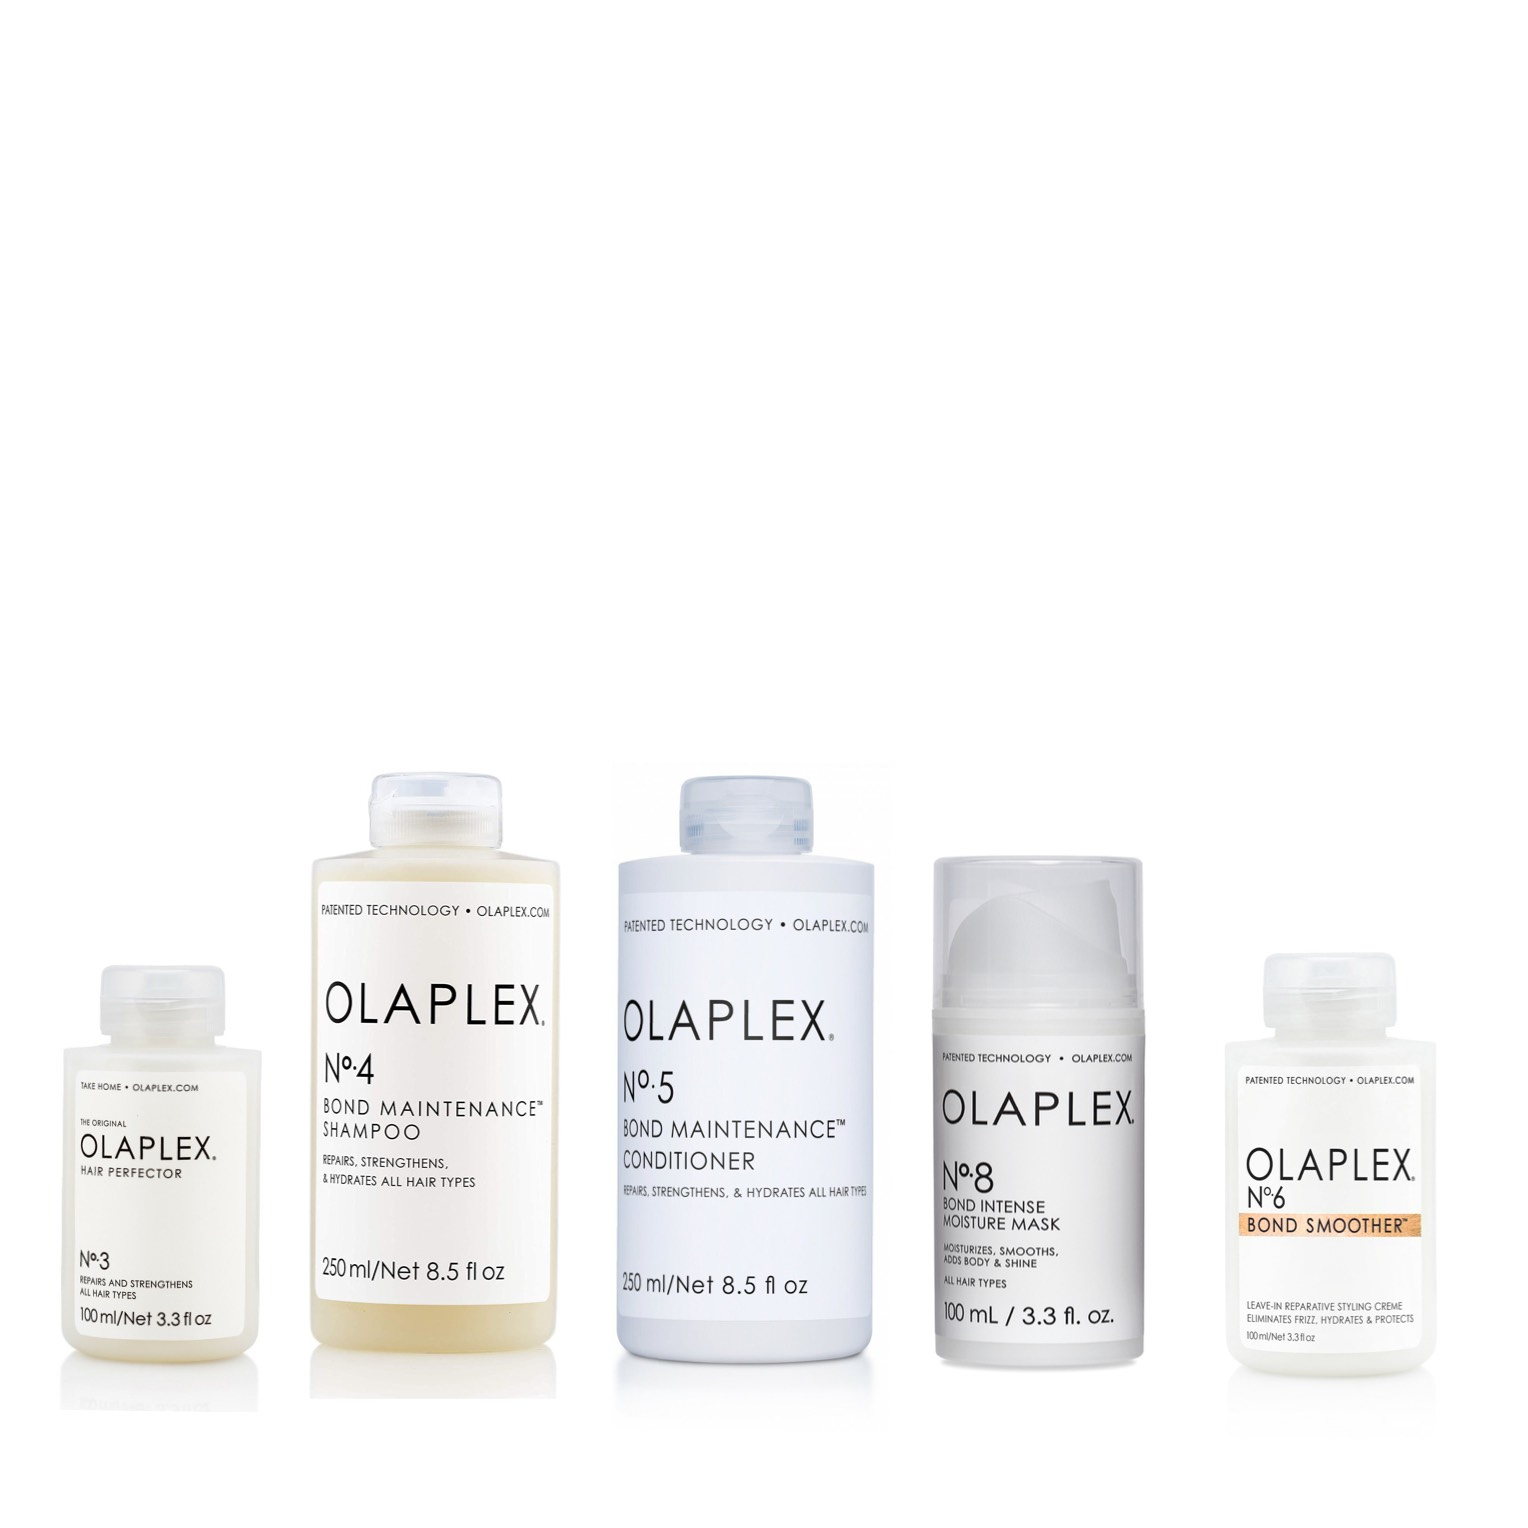 Olaplex Set - Olaplex No 3 Hair Perfector 100ml + Olaplex No 4 Bond Maintenance Shampoo 250ml + Olaplex No 5 Bond Maintenance Conditioner 250ml + Olaplex No 8 Bond Intense Moisture Mask 100ml + Olaplex No 6 Bond Smoother